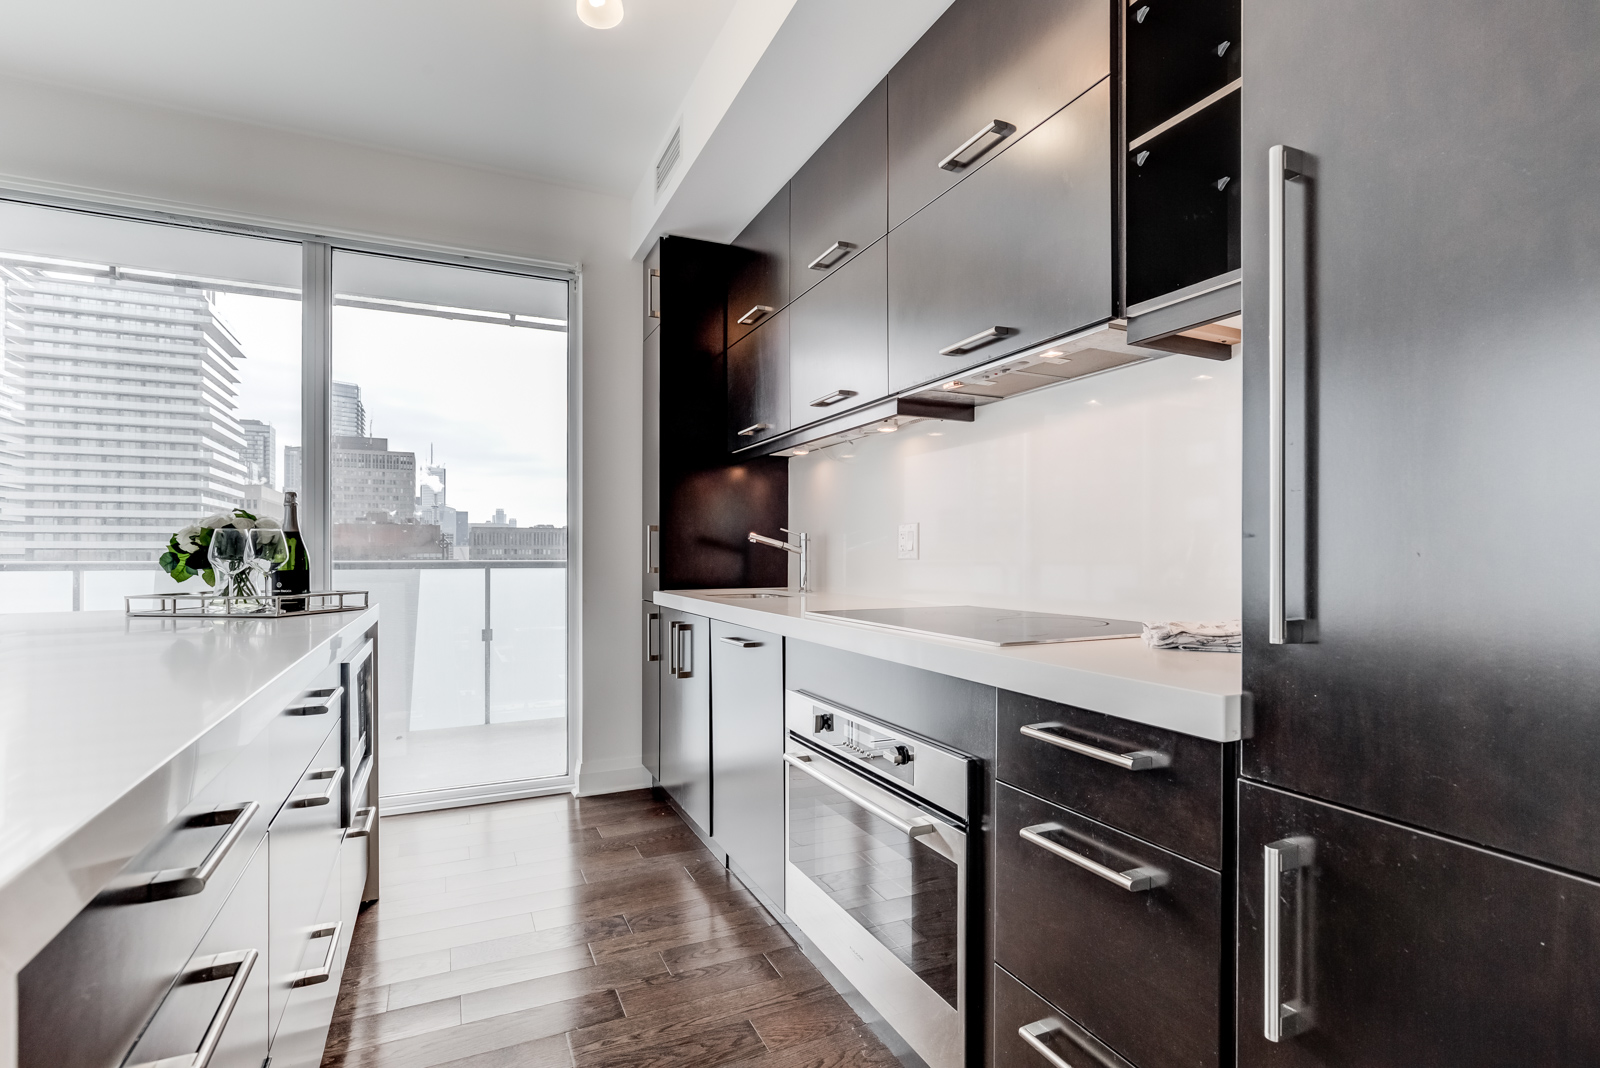 Kitchen and balcony shot